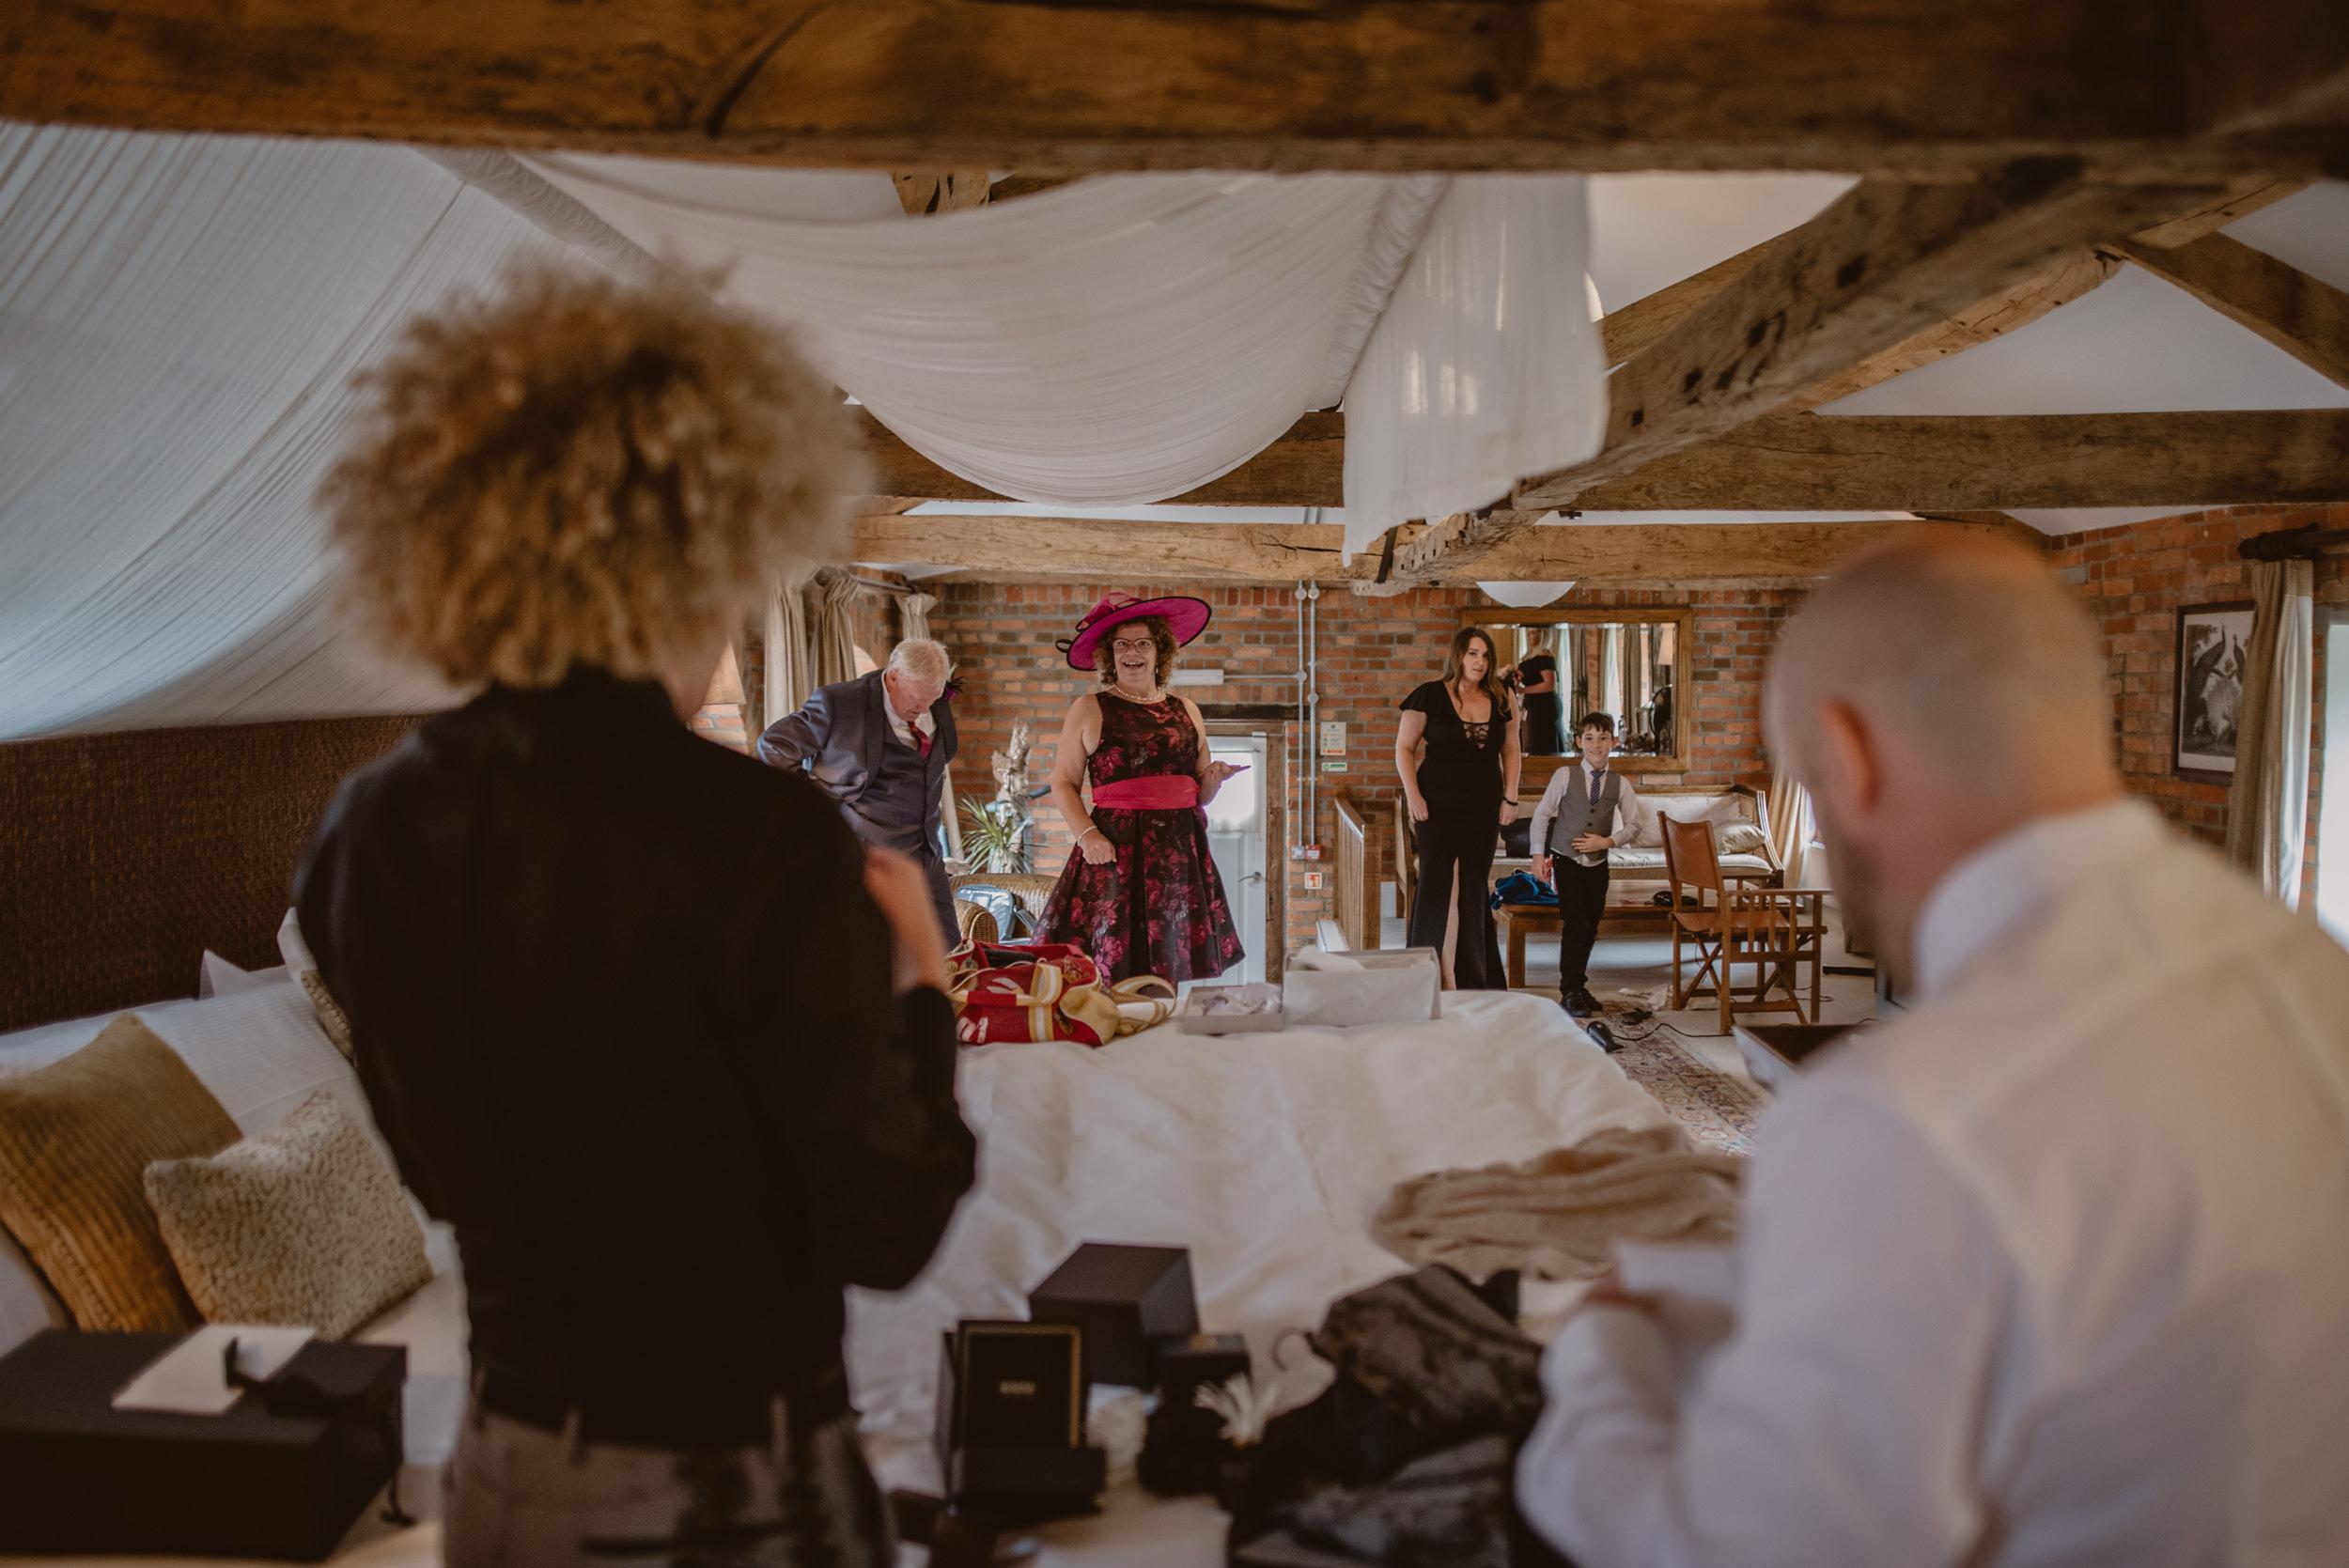 Barry-and-Chaz-wedding-Wasing-Park-Berkshire-Manu-Mendoza-Wedding-Photography-140.jpg